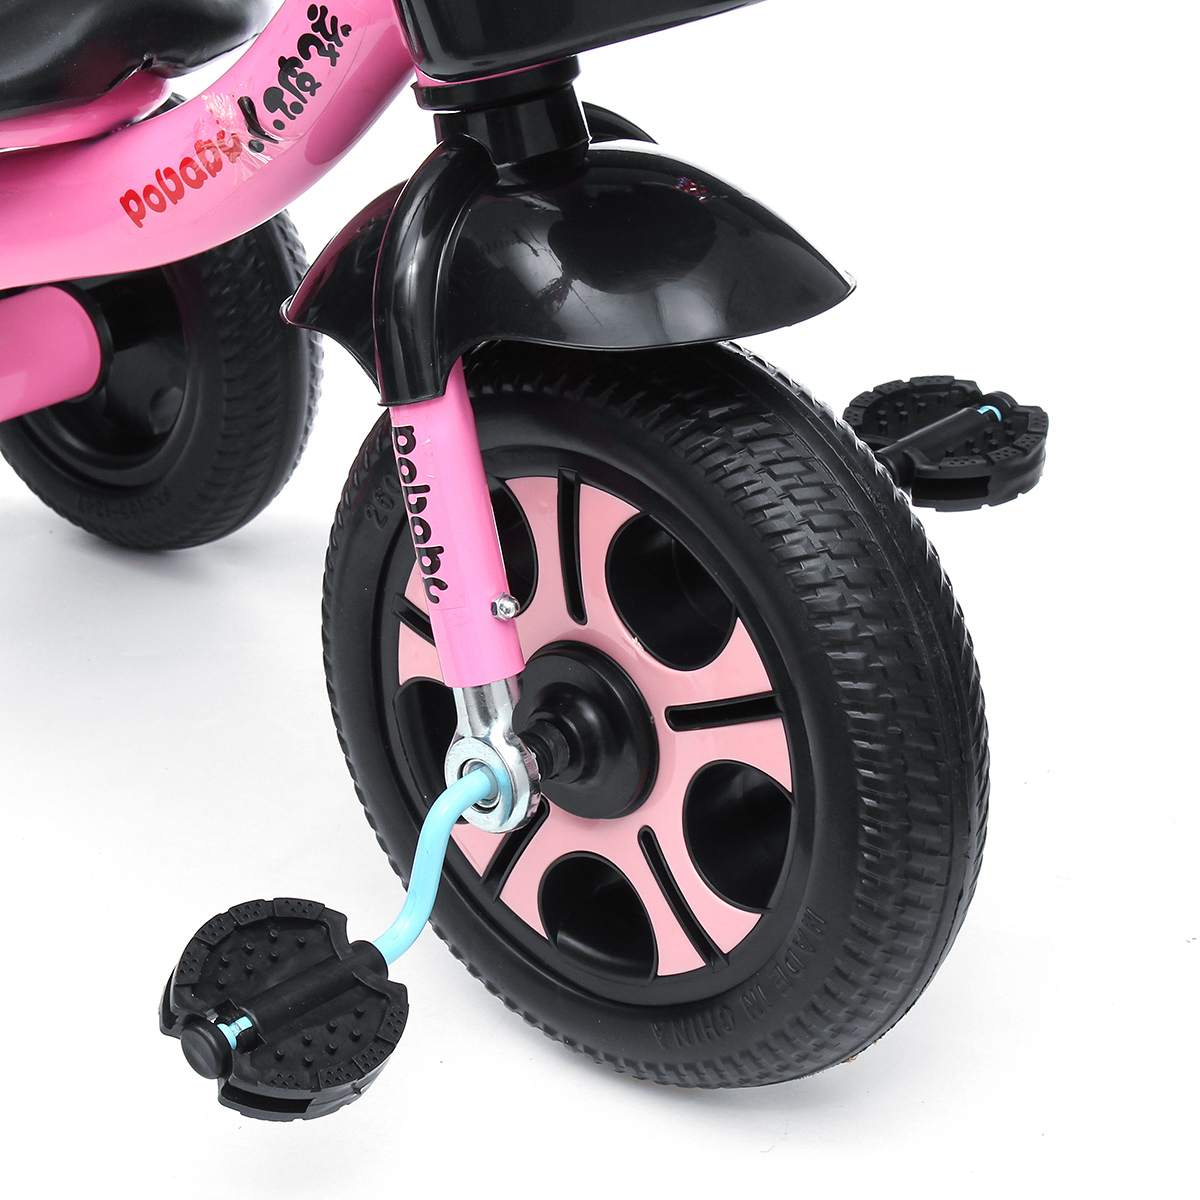 BIKIGHT 3 Wheels Kids Ride On Tricycle Bike Children Ride Toddler Balance Baby M